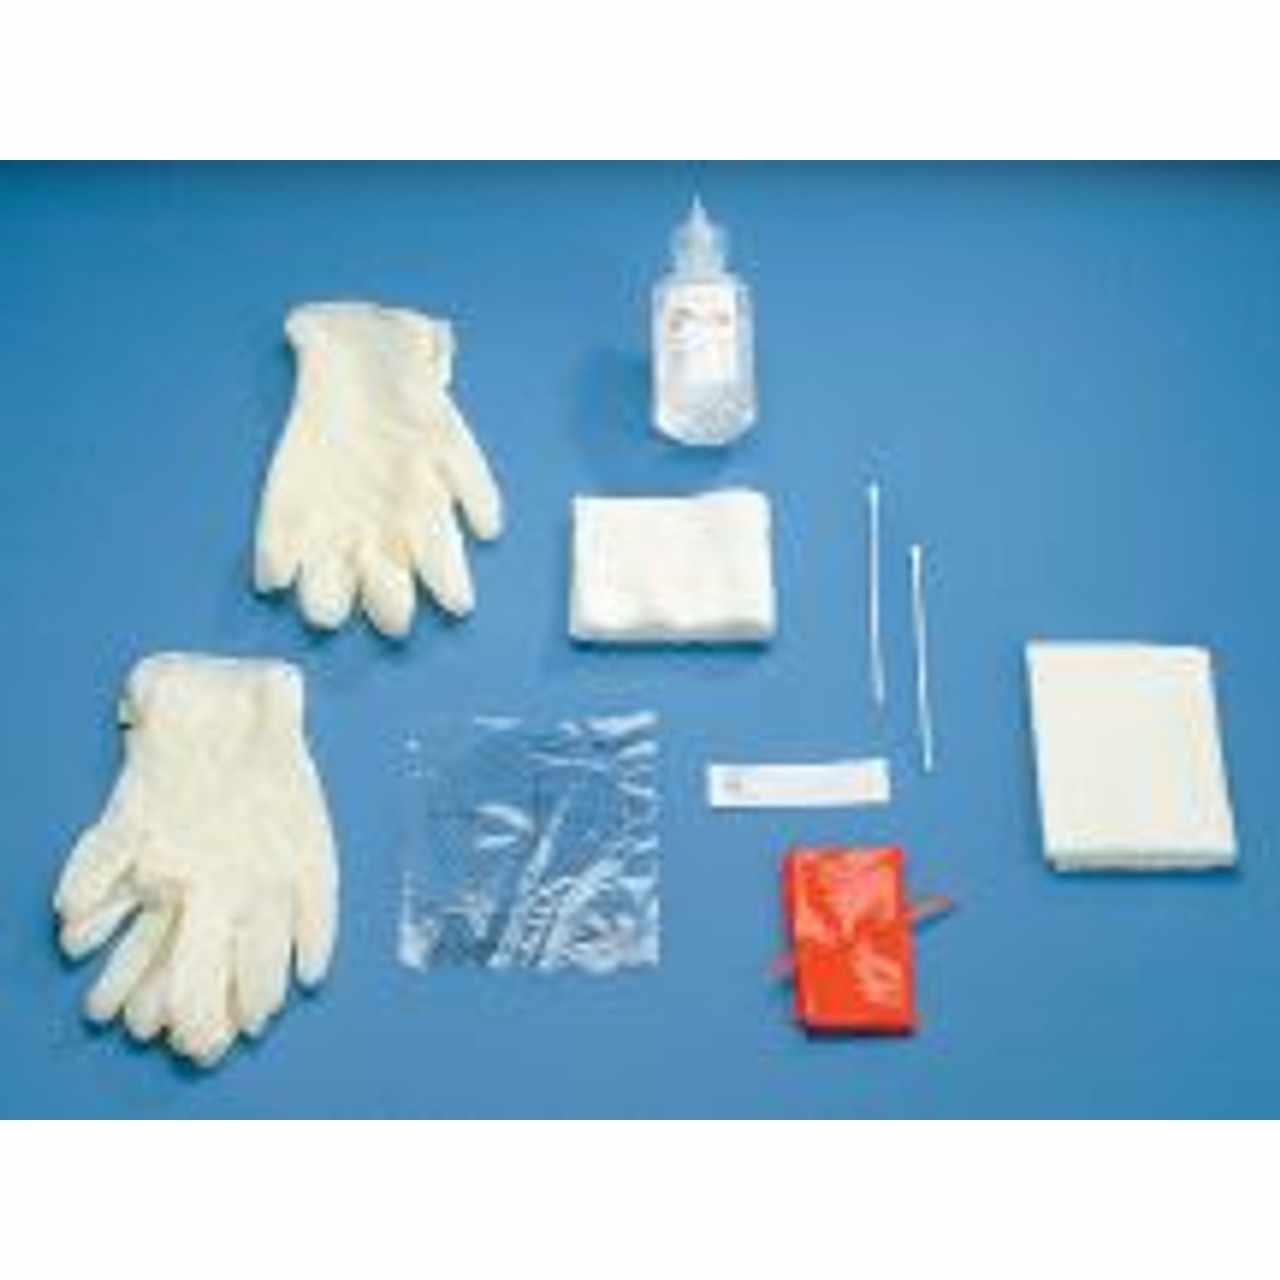 Deroyal Central Line Dressing Kit, Natural Rubber Latex